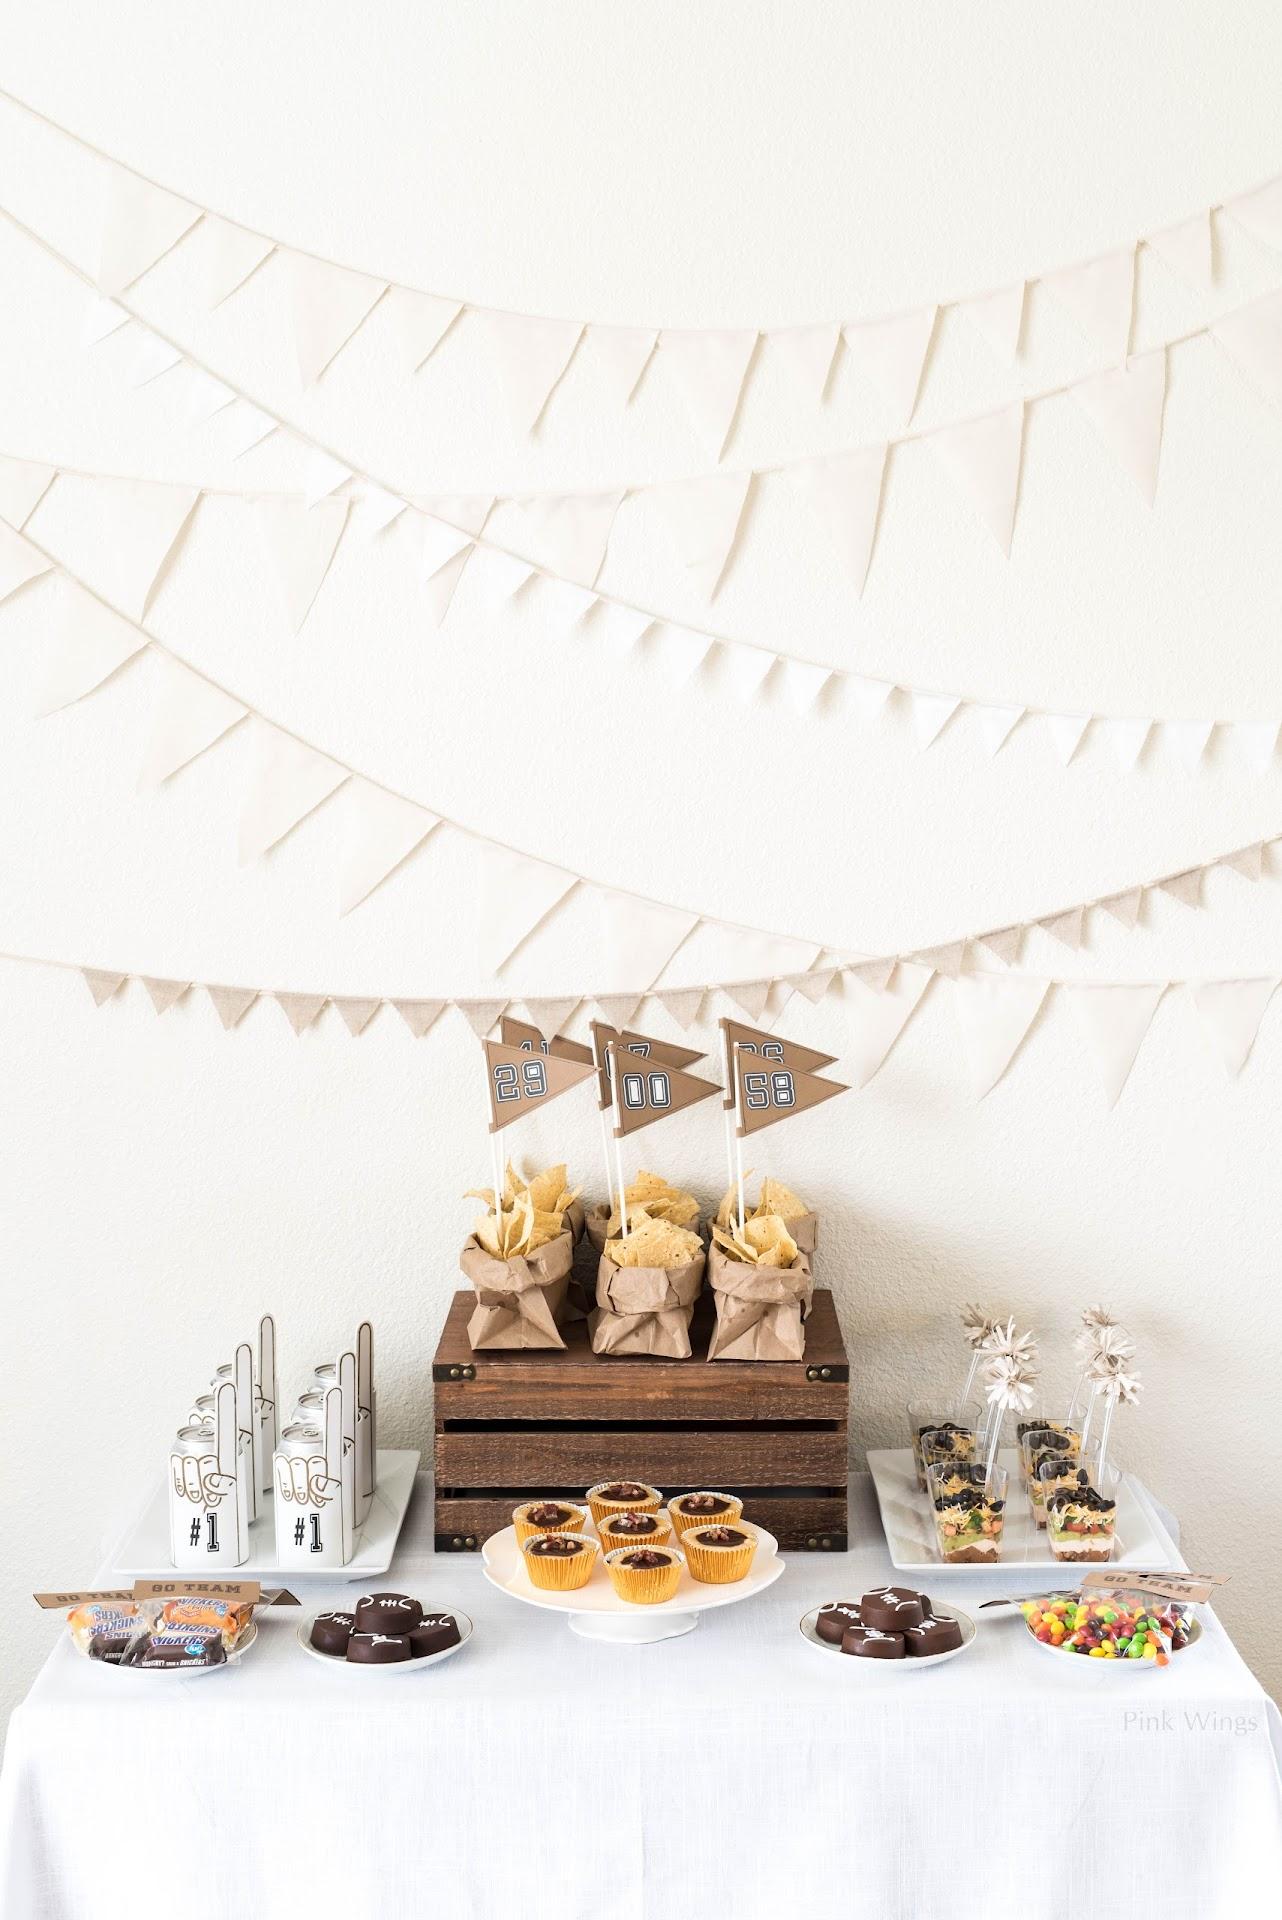 football party, birthday, tailgating, party food ideas, man food, man party, sports party, vintage, kraft burlap white theme, brown white,